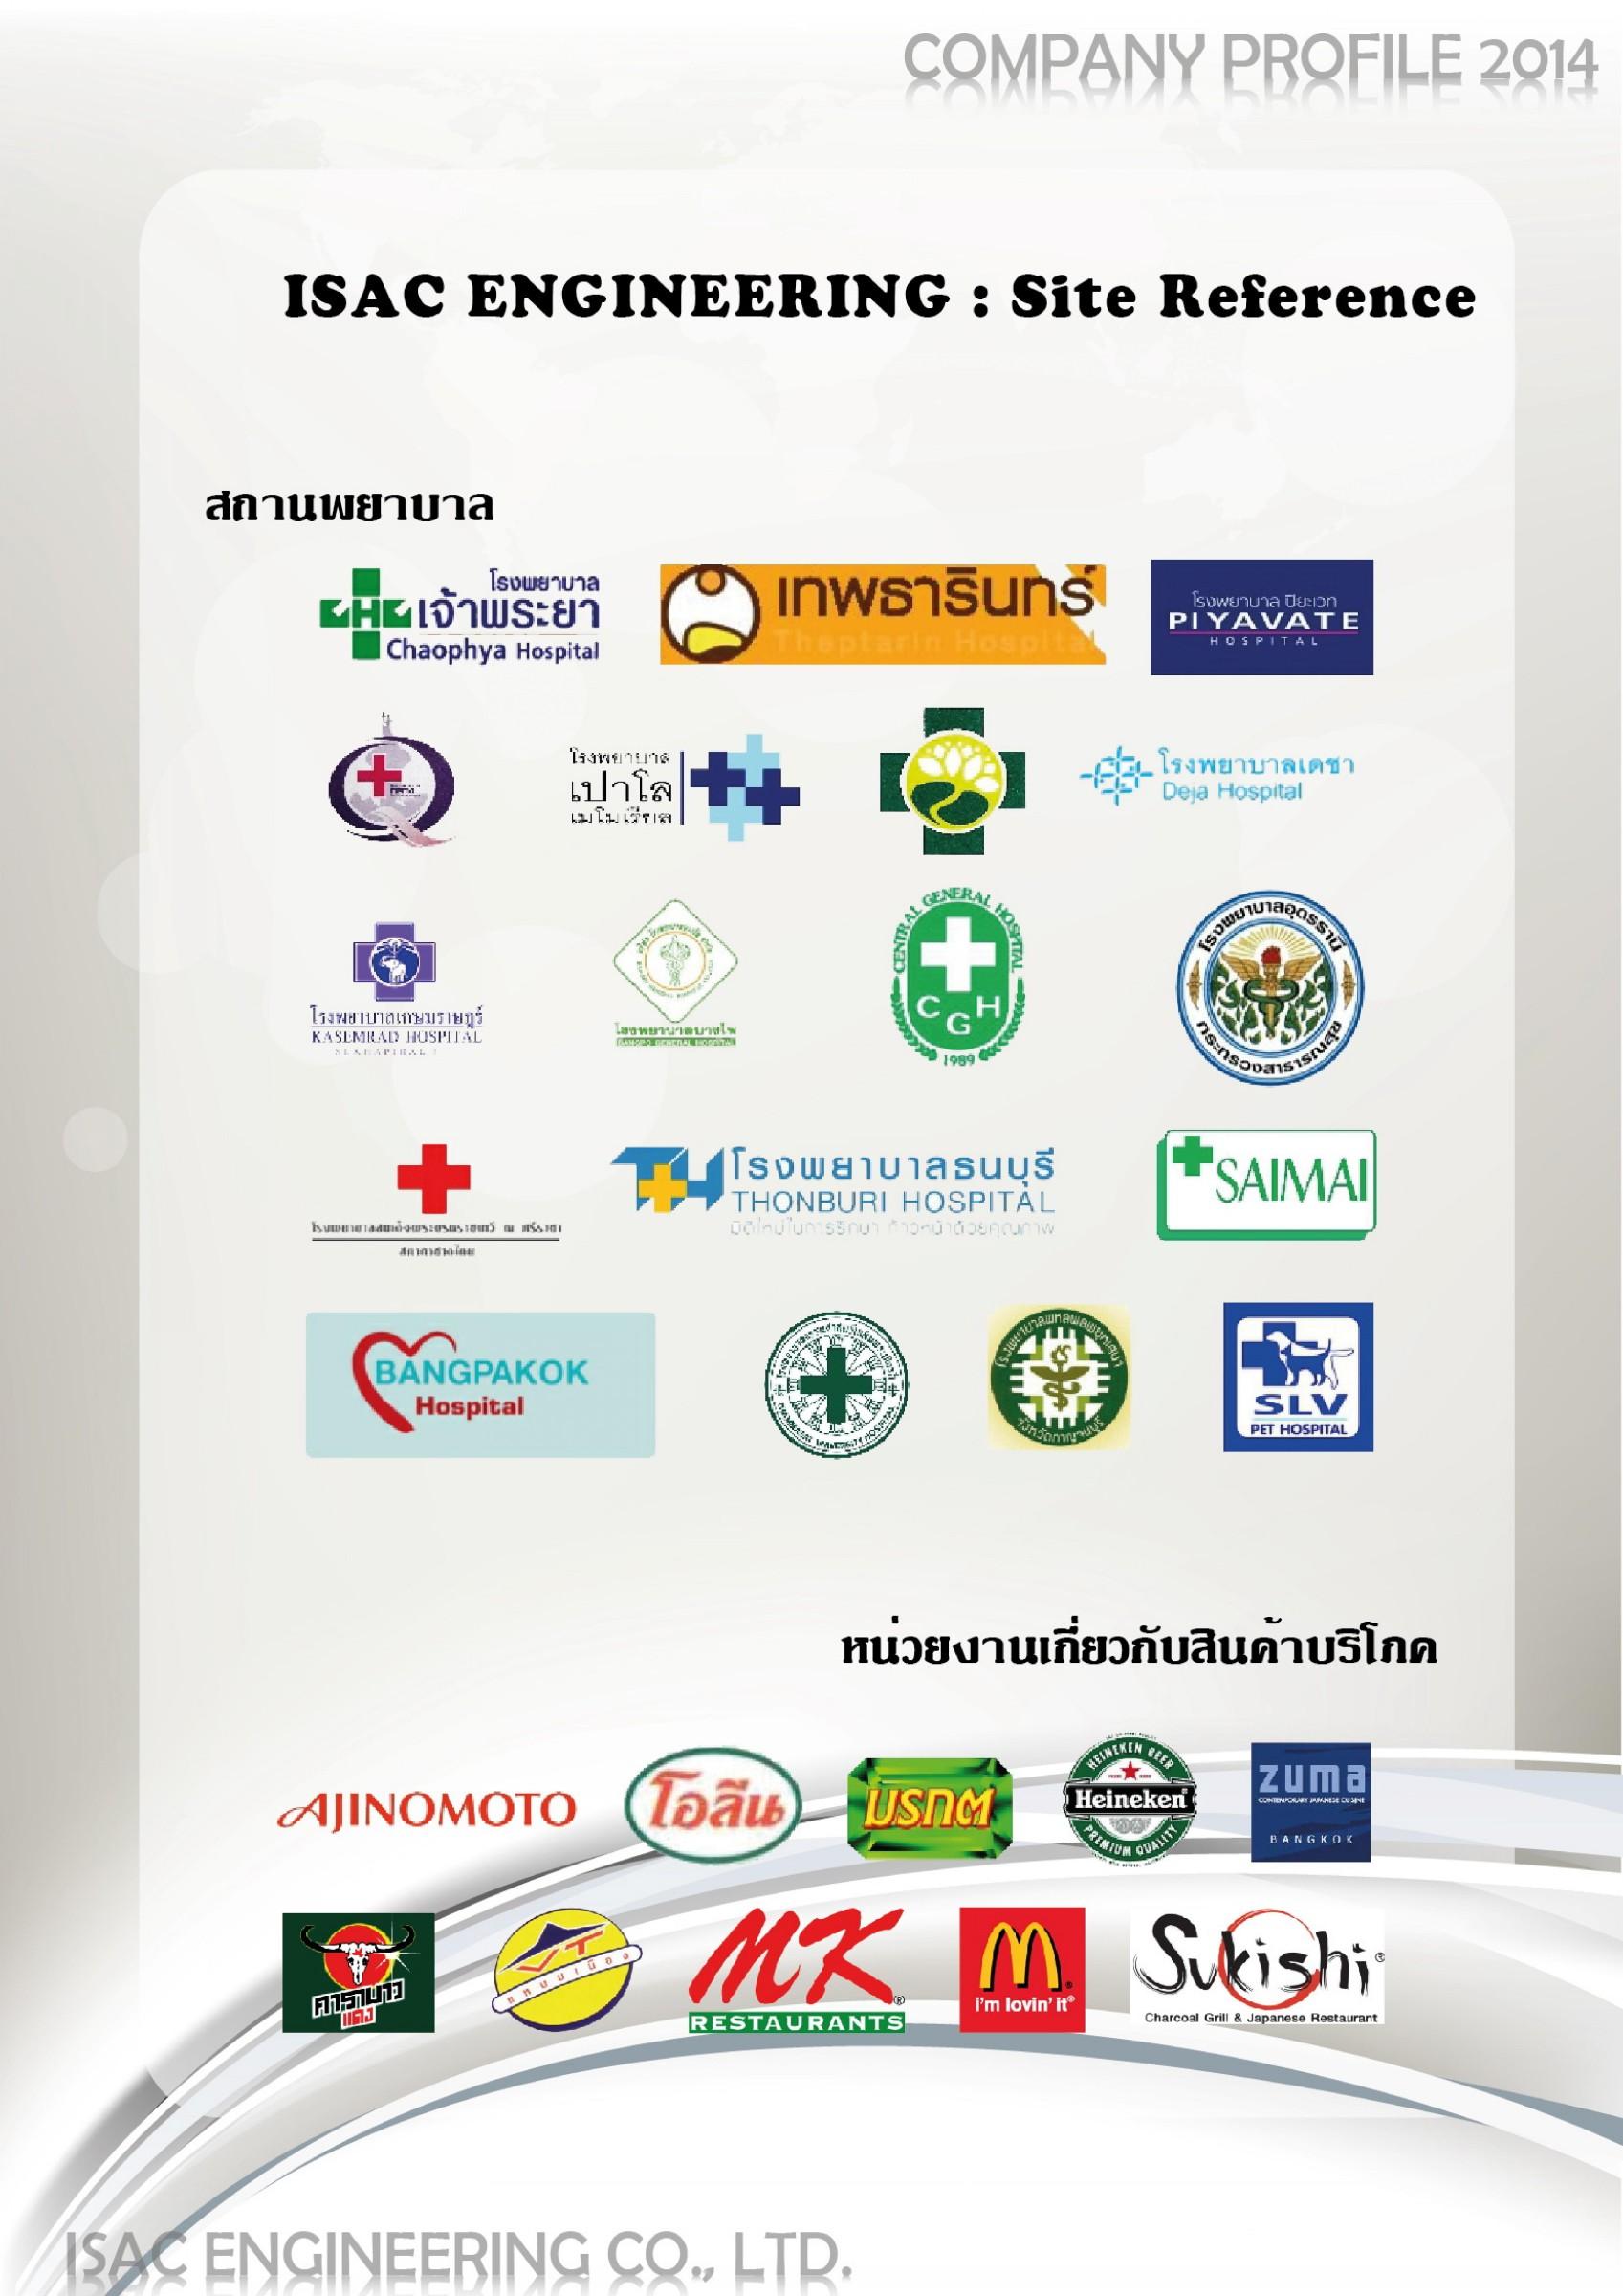 companyprofile2014-page-012